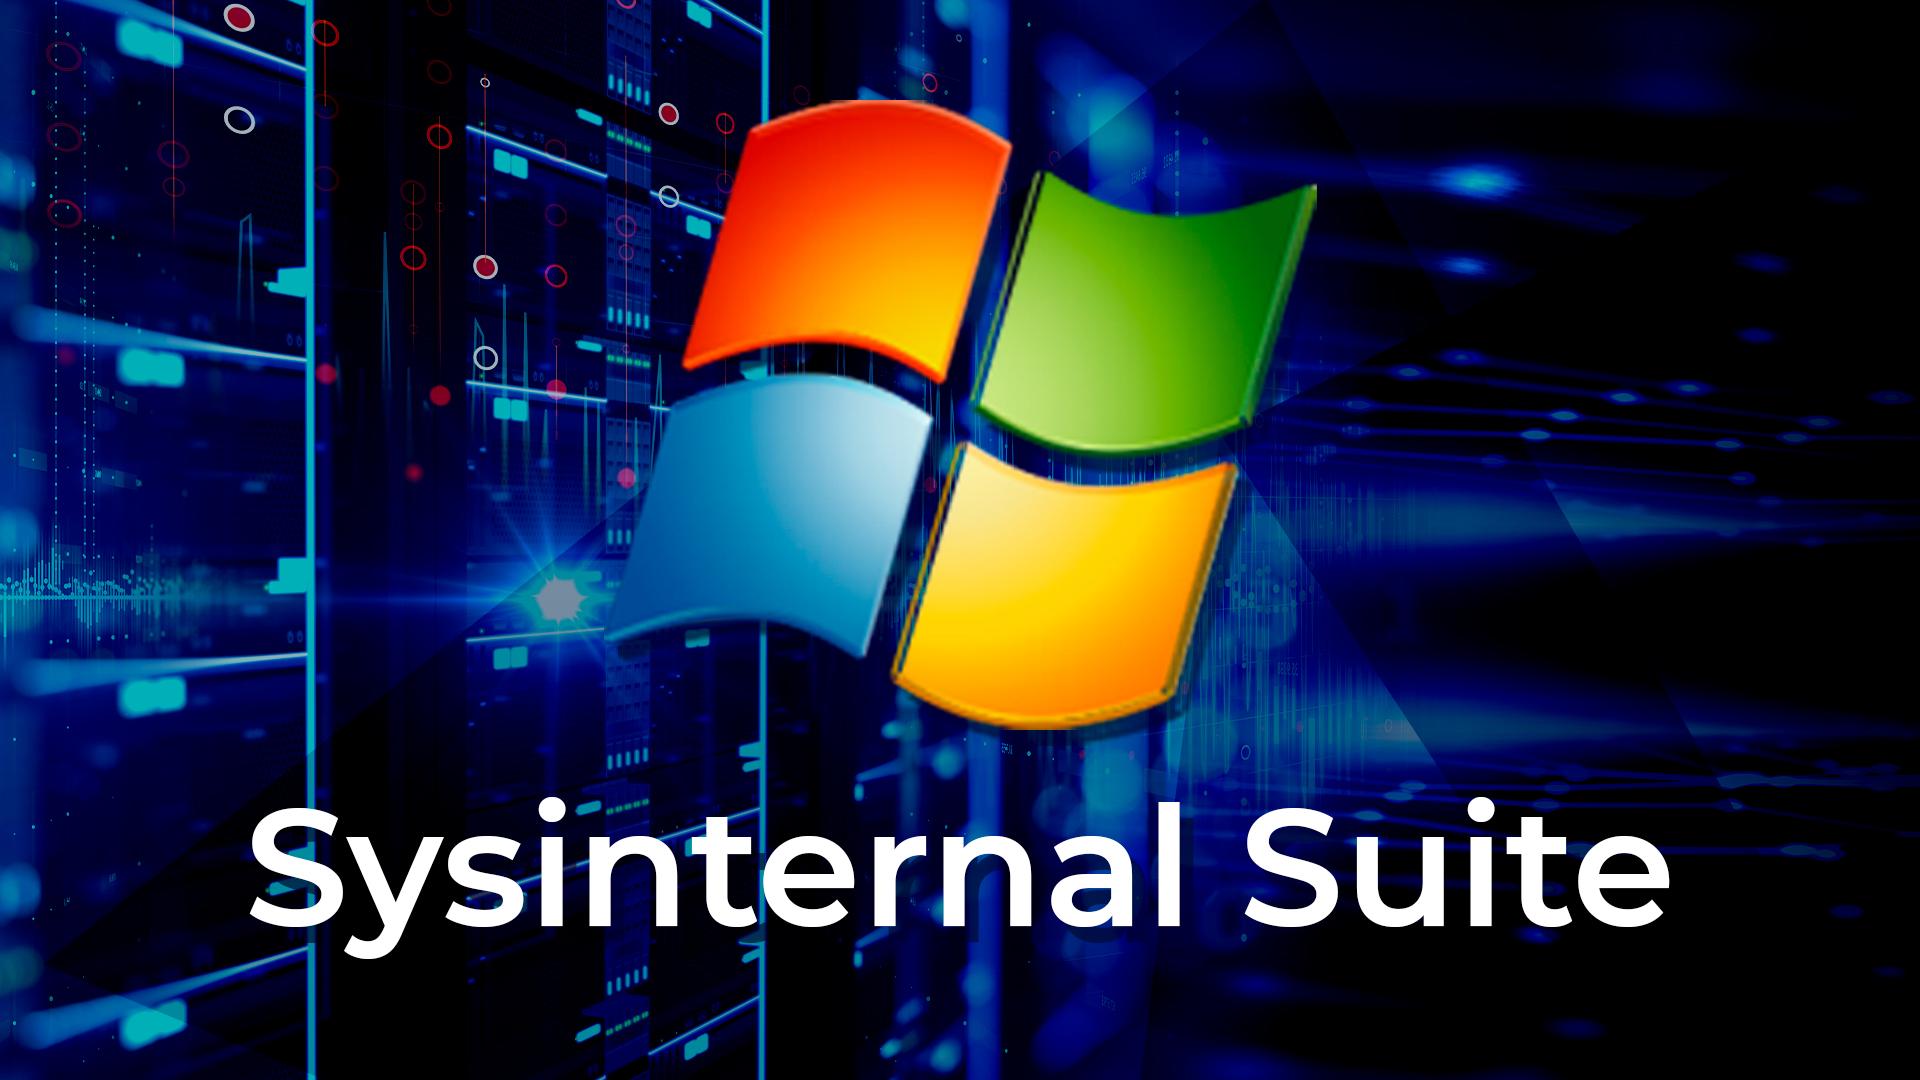 Systeminfo, Sysinternals, Systemanalyse, Windows Sysinternals, Sysinternal Suite